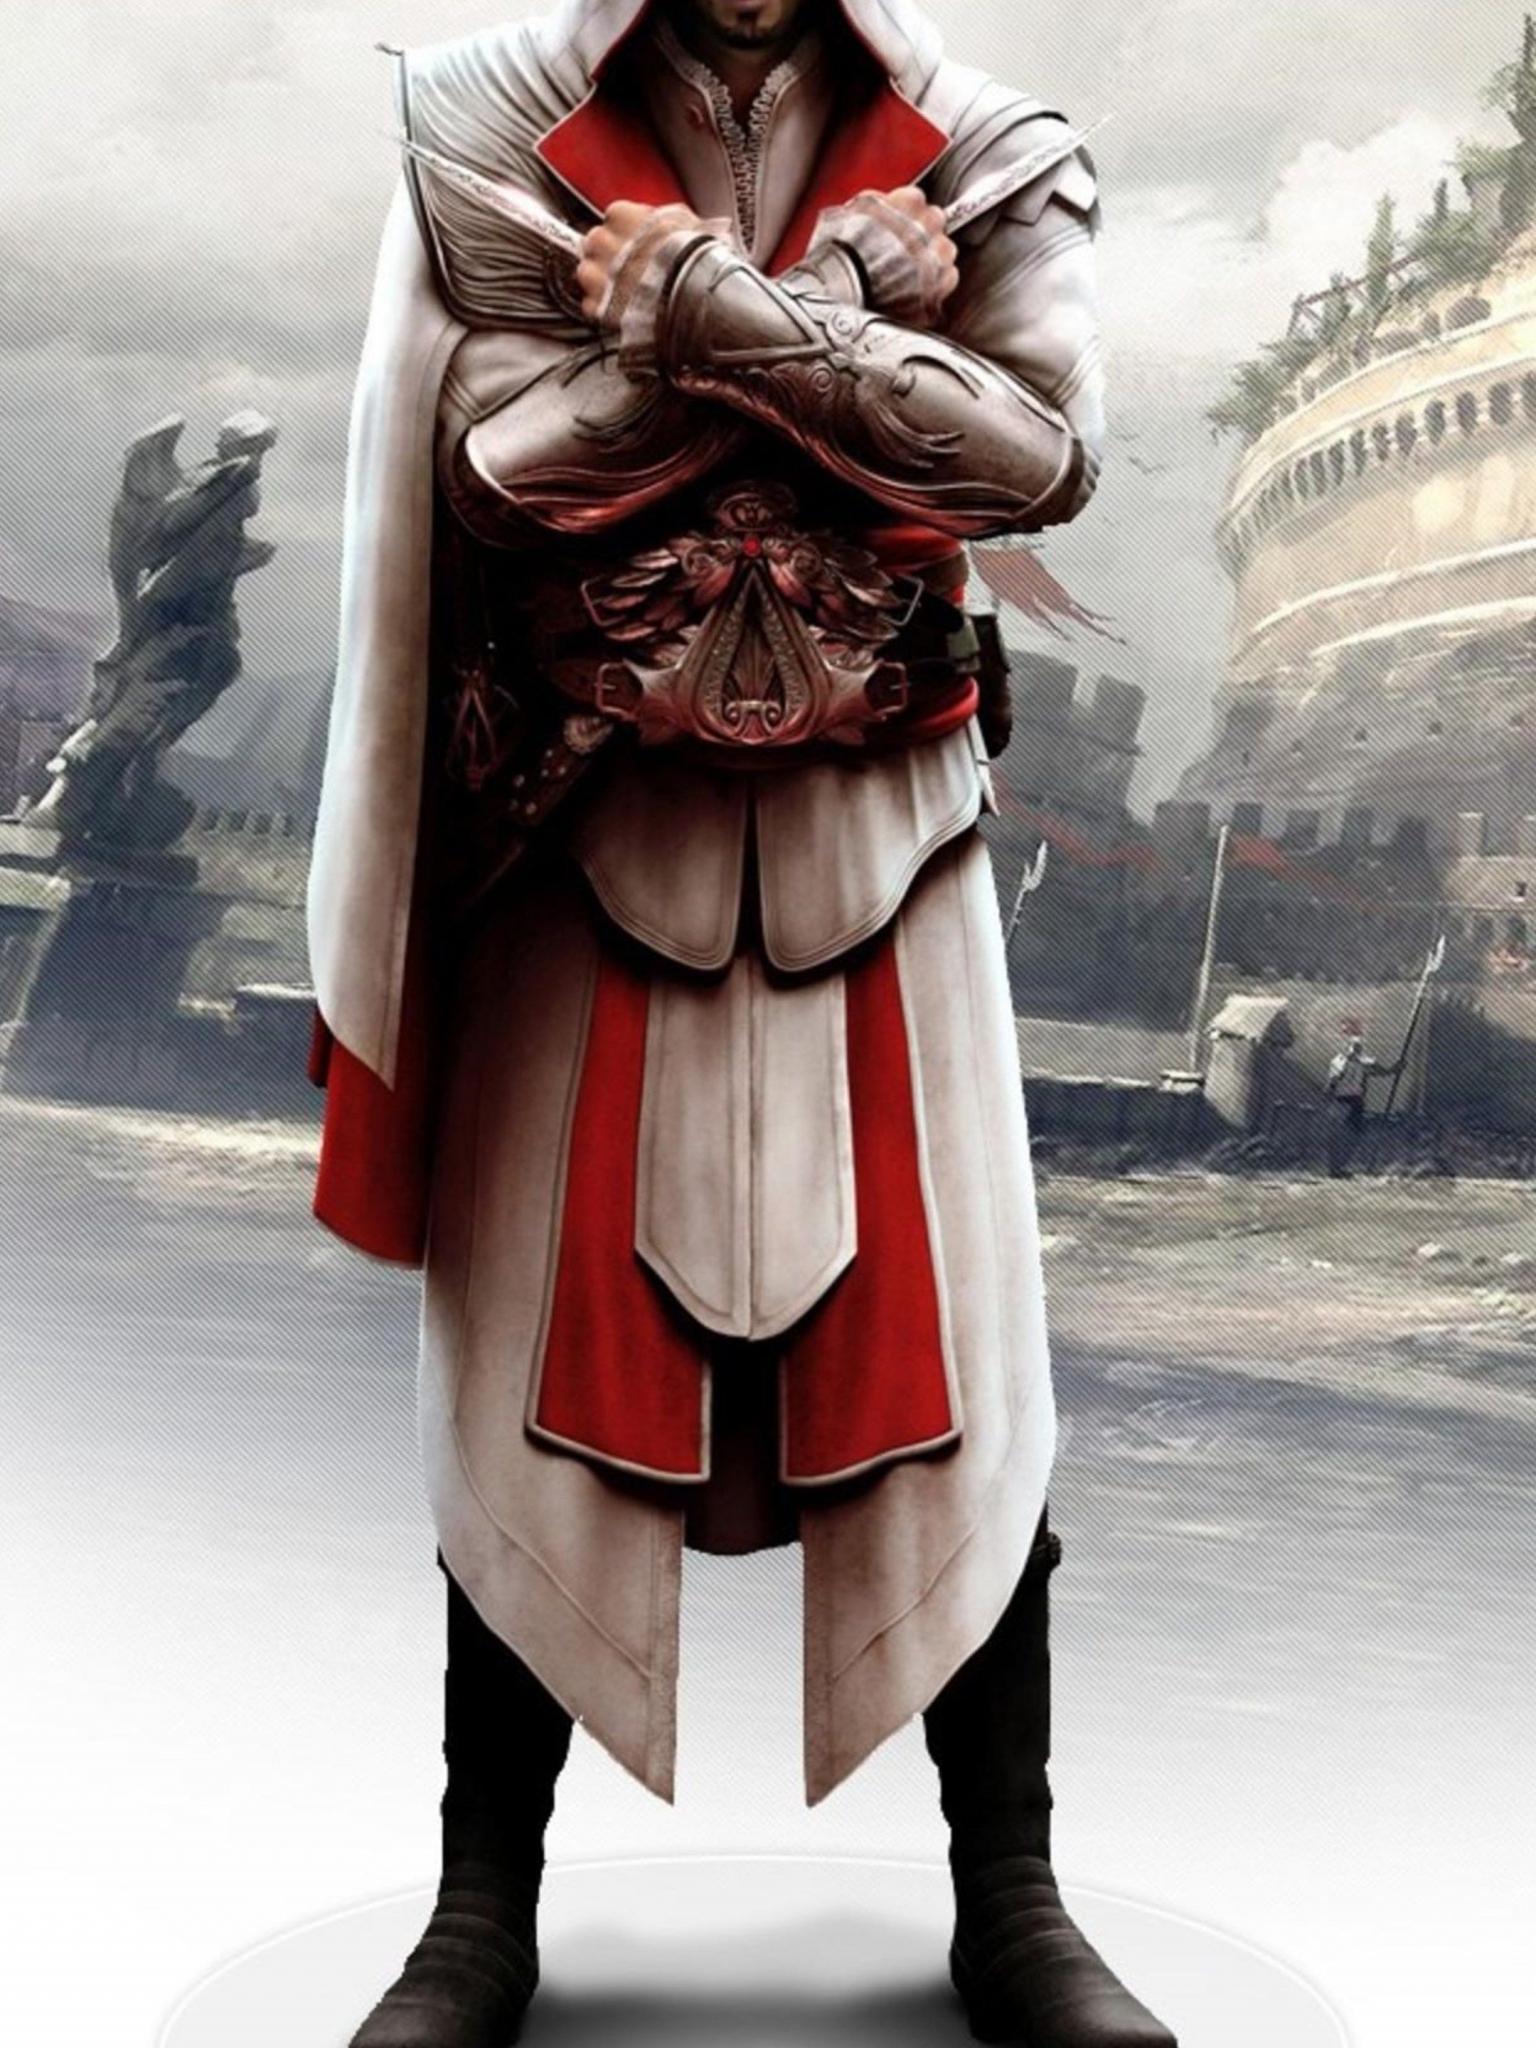 Free Download Misc Ezio In Assassins Creed Brotherhood